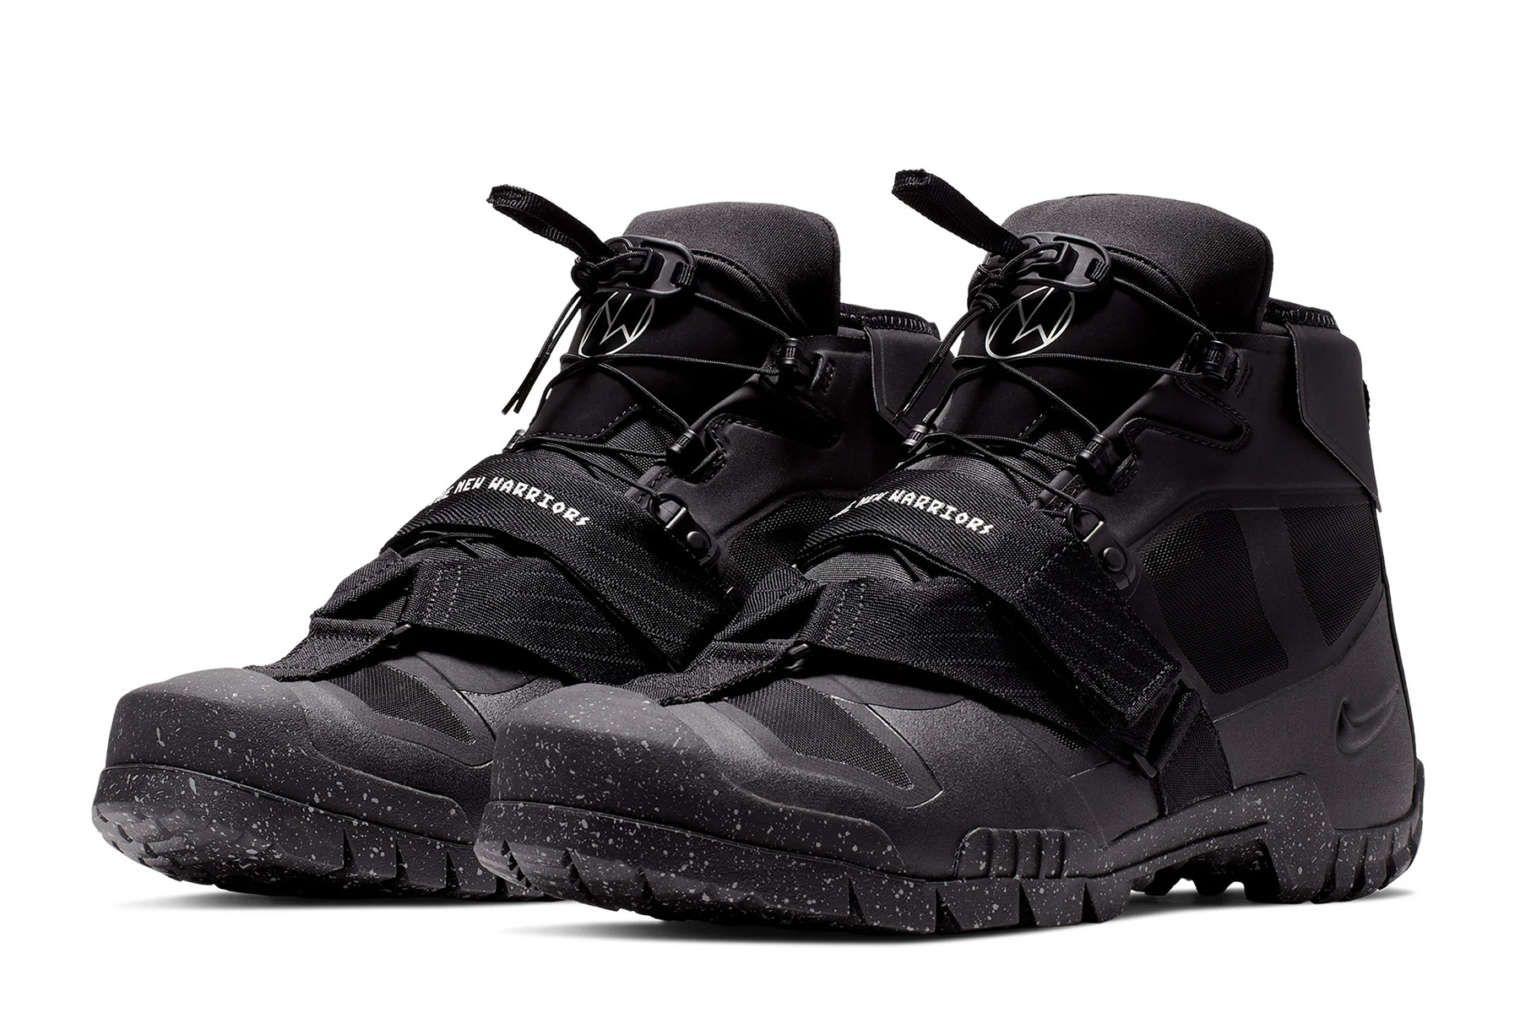 Undercover x Nike SFB Mountain Nike sfb, Boots, Nike